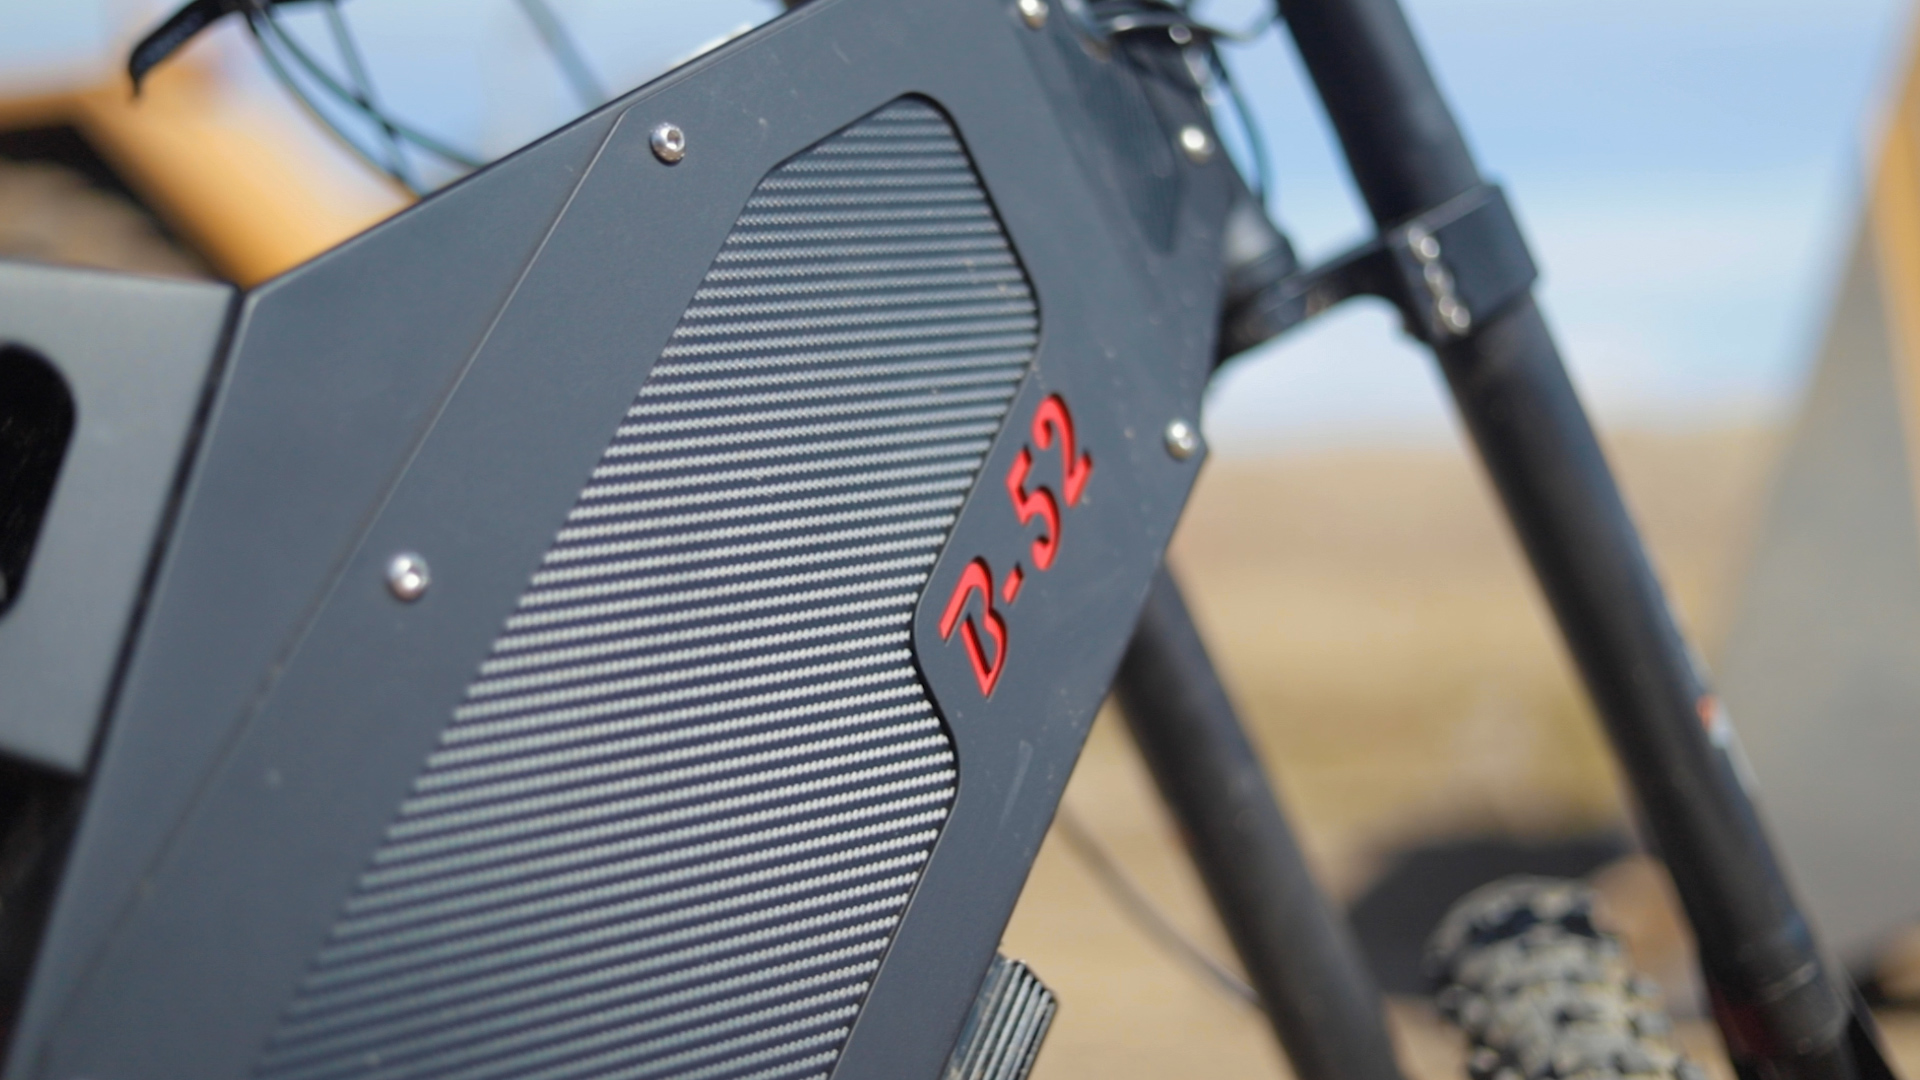 electrified-reviews-stealth-b52-bomber-electric-bike-review-logo.jpg